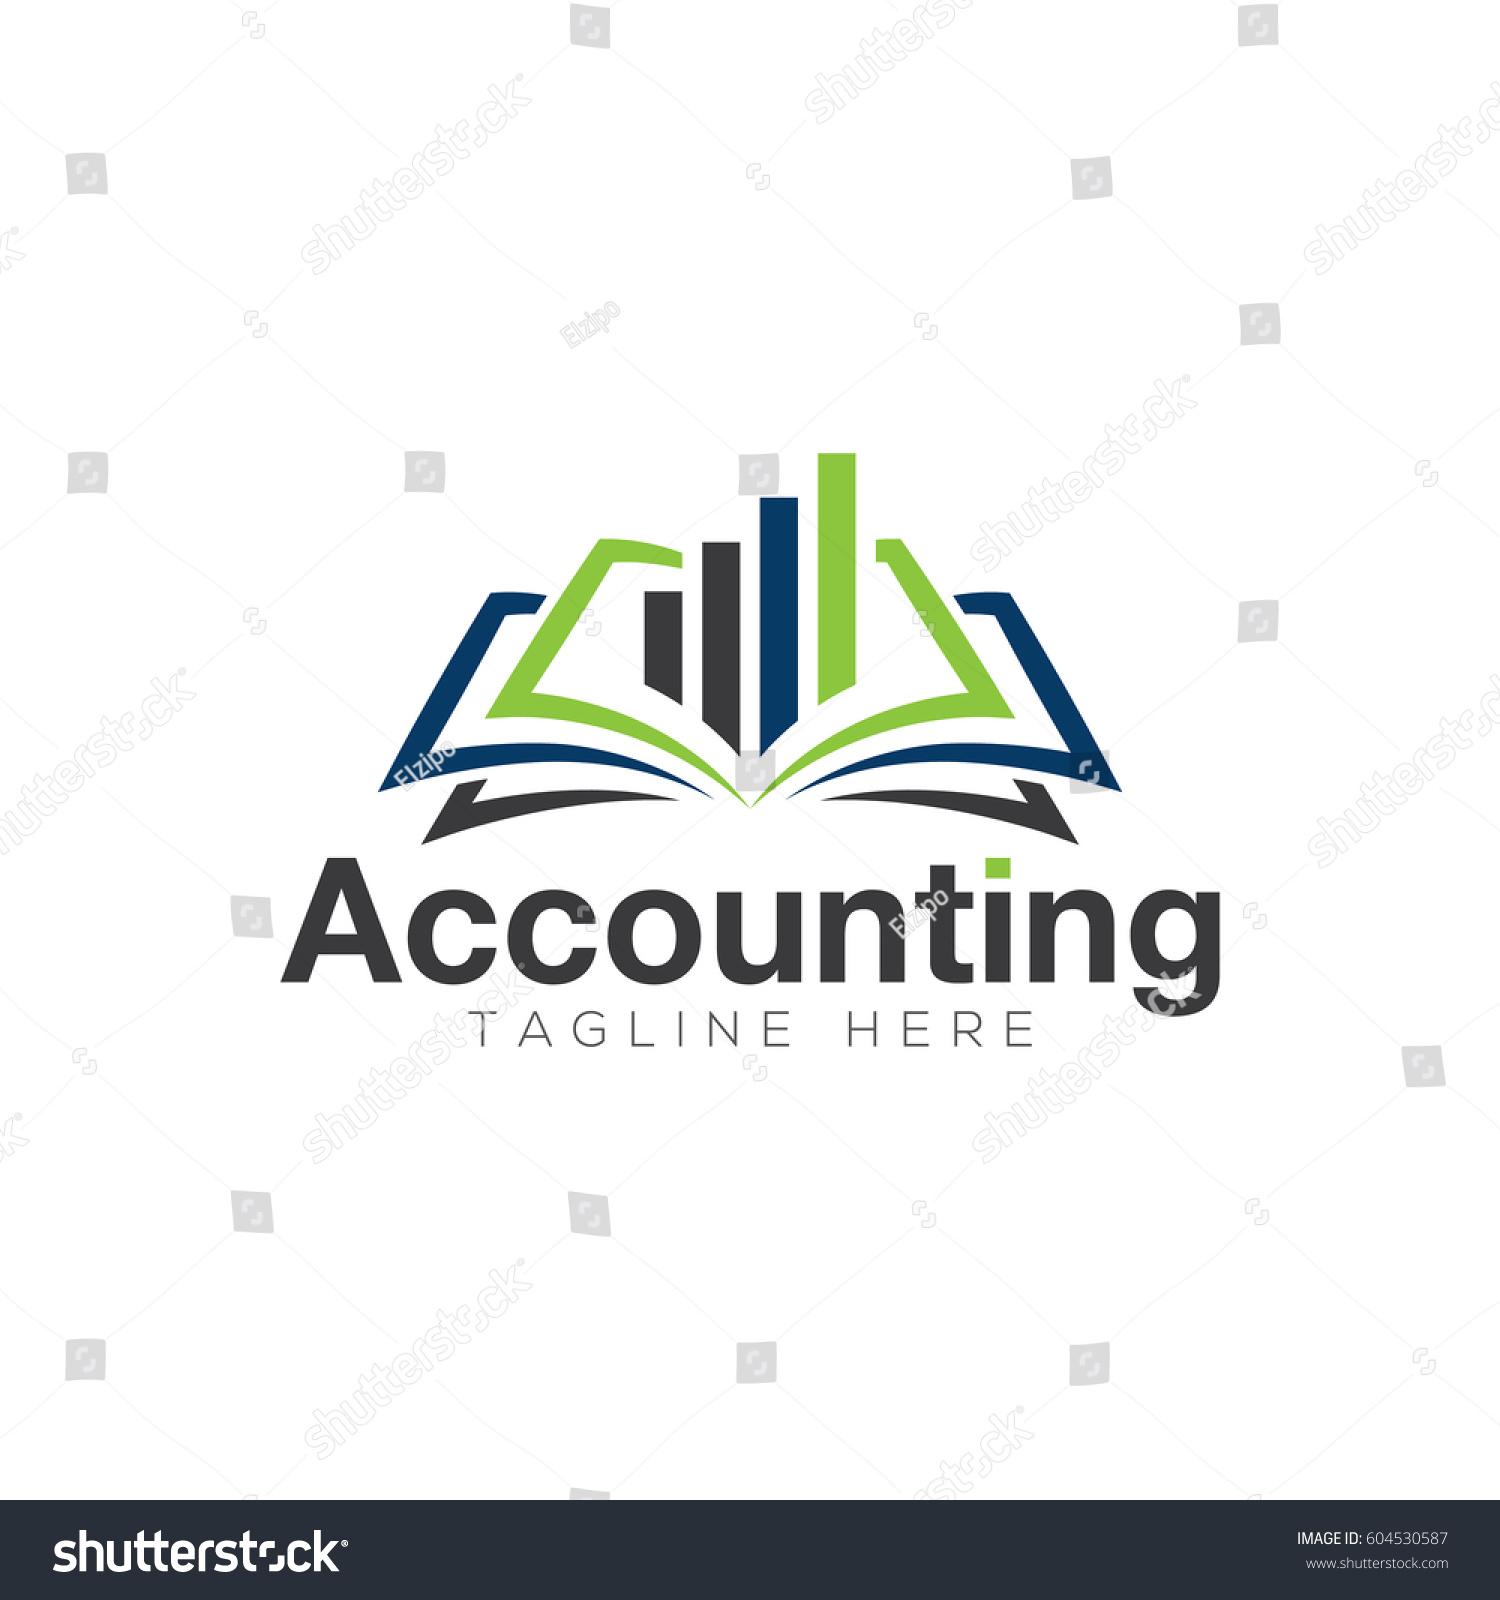 Accounting Logo Design Stock Vector 604530587 - Shutterstock